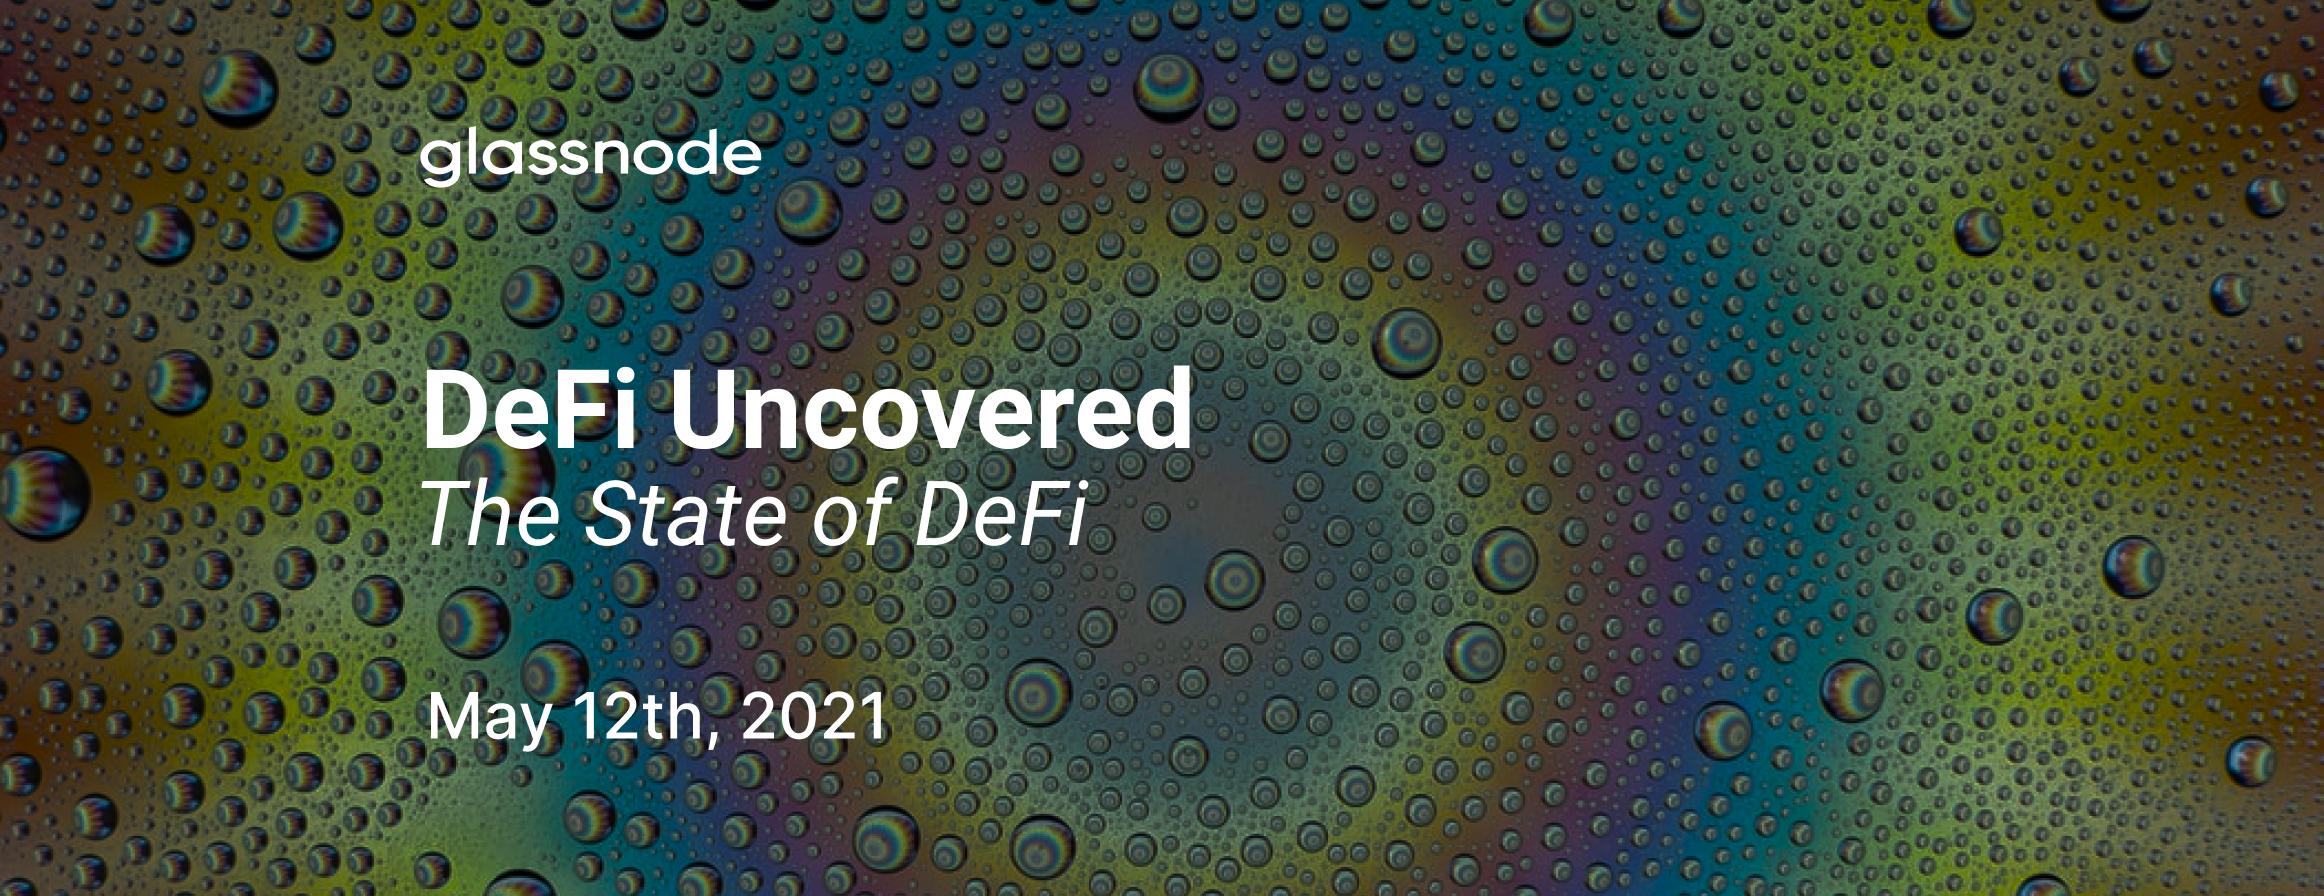 DeFi发展现状报告:你认为DeFi发展到哪个阶段了?